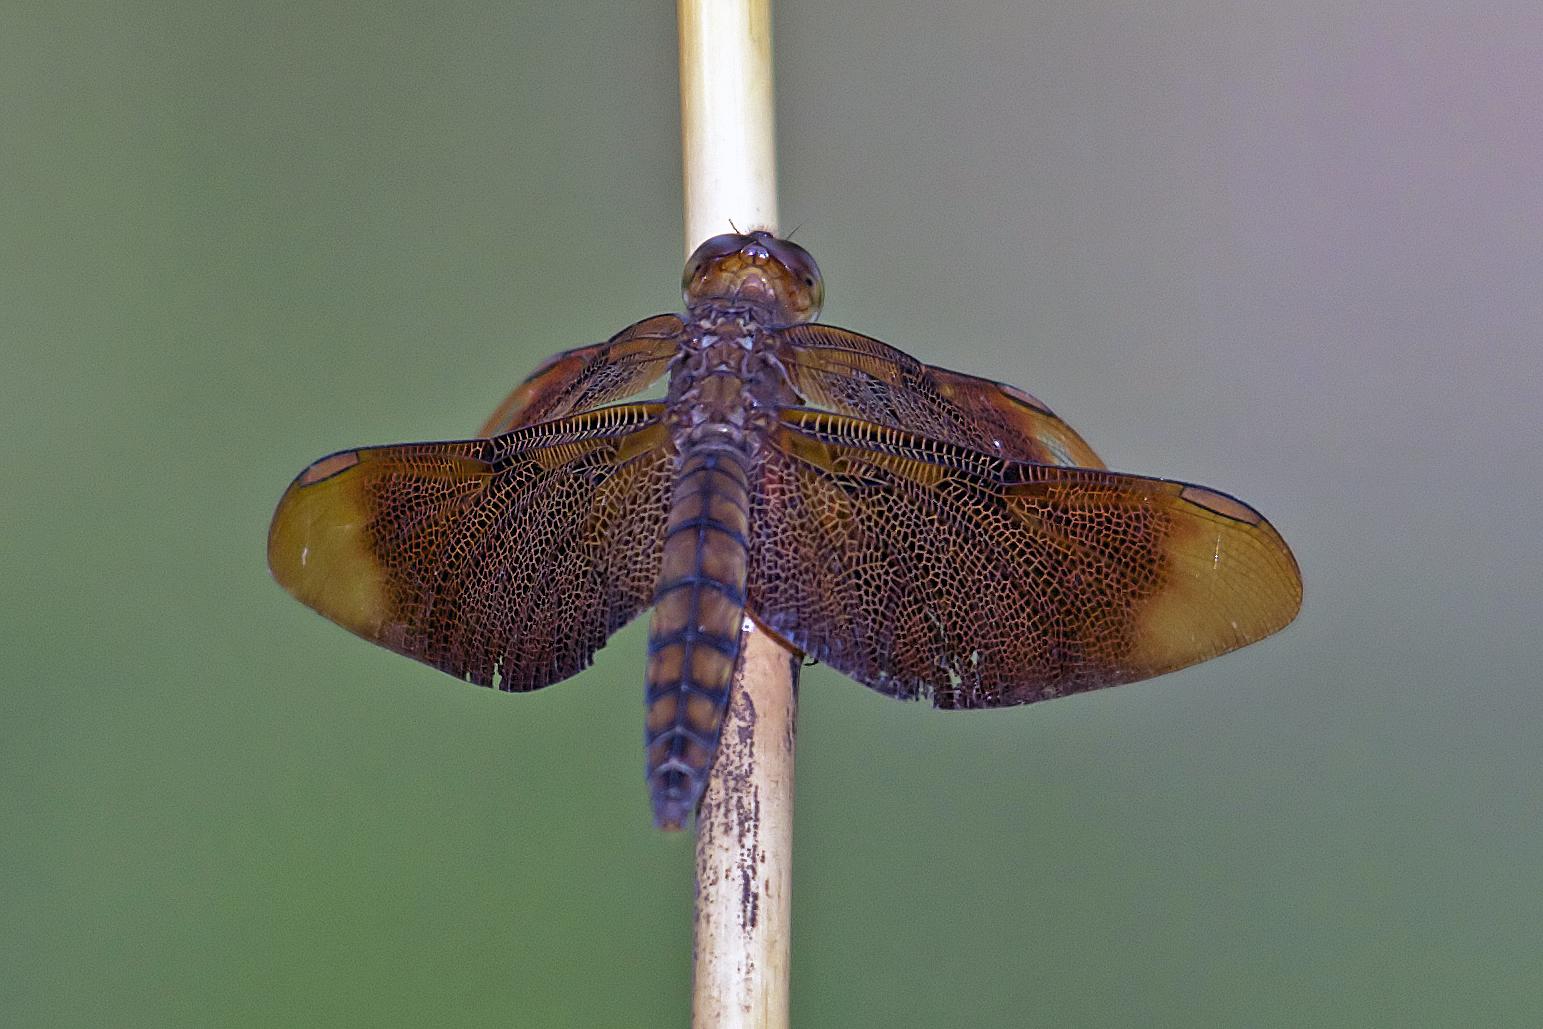 Image of Black Stream Glider